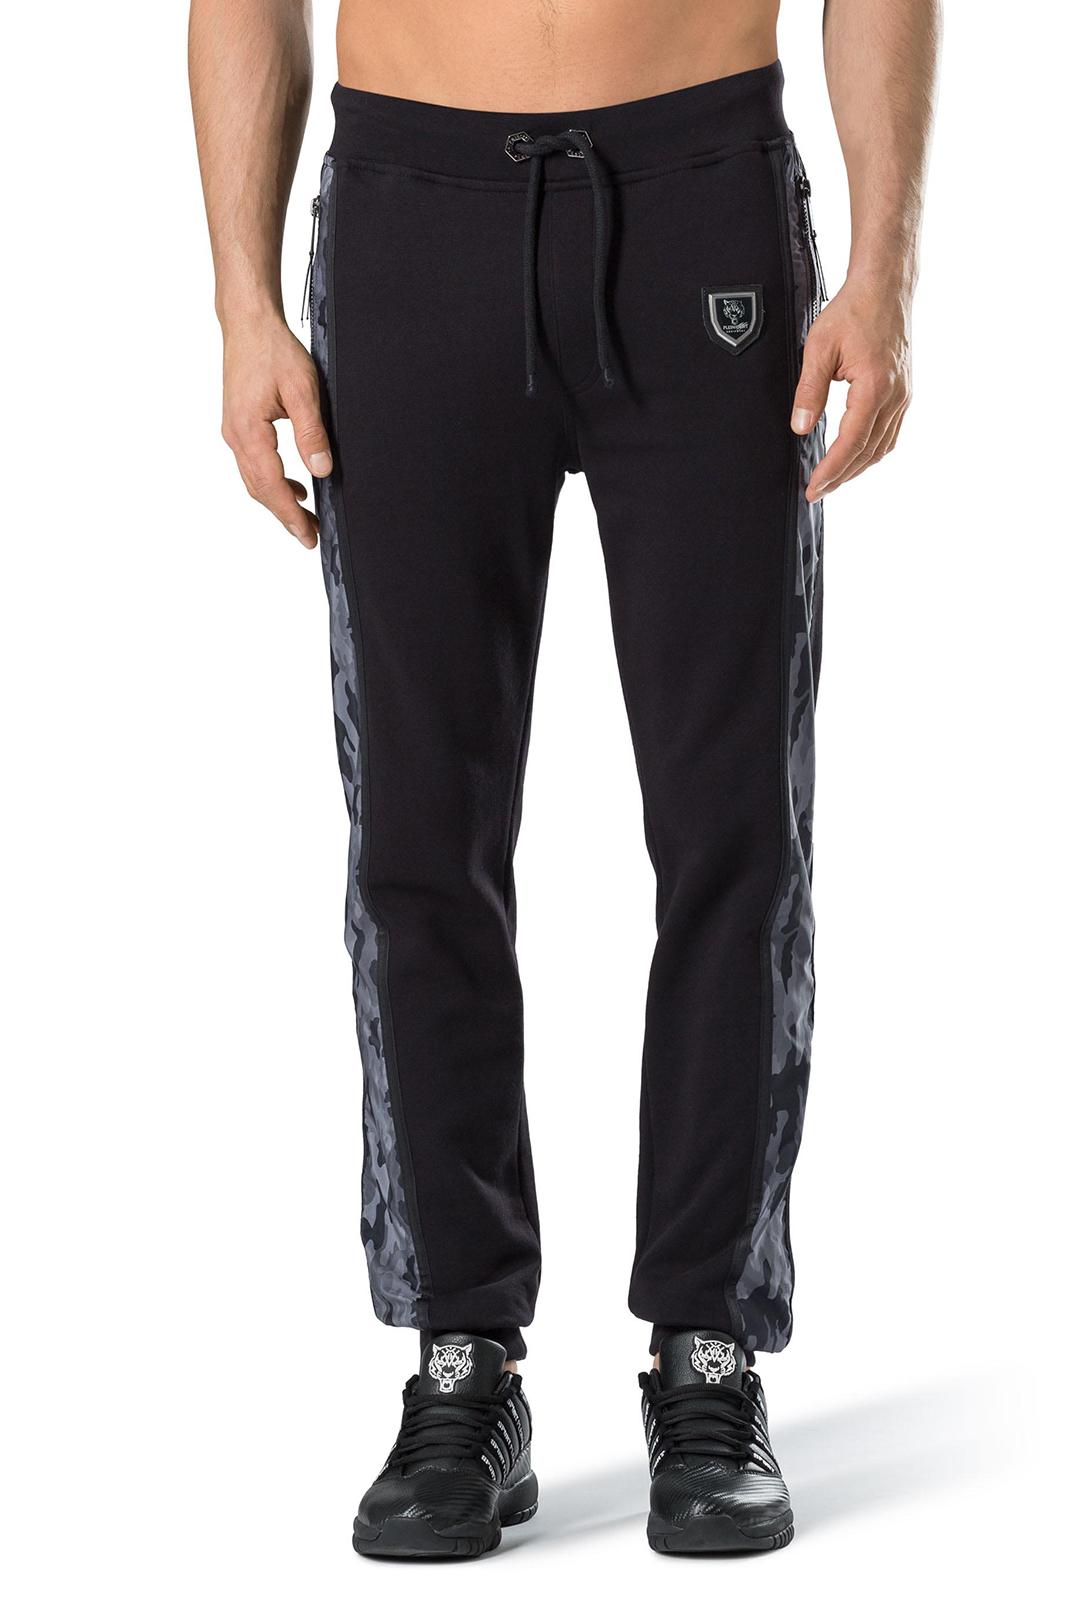 Pantalons sport/streetwear  Plein Sport P17C MJT0116 02O2 BLACK/BLACK